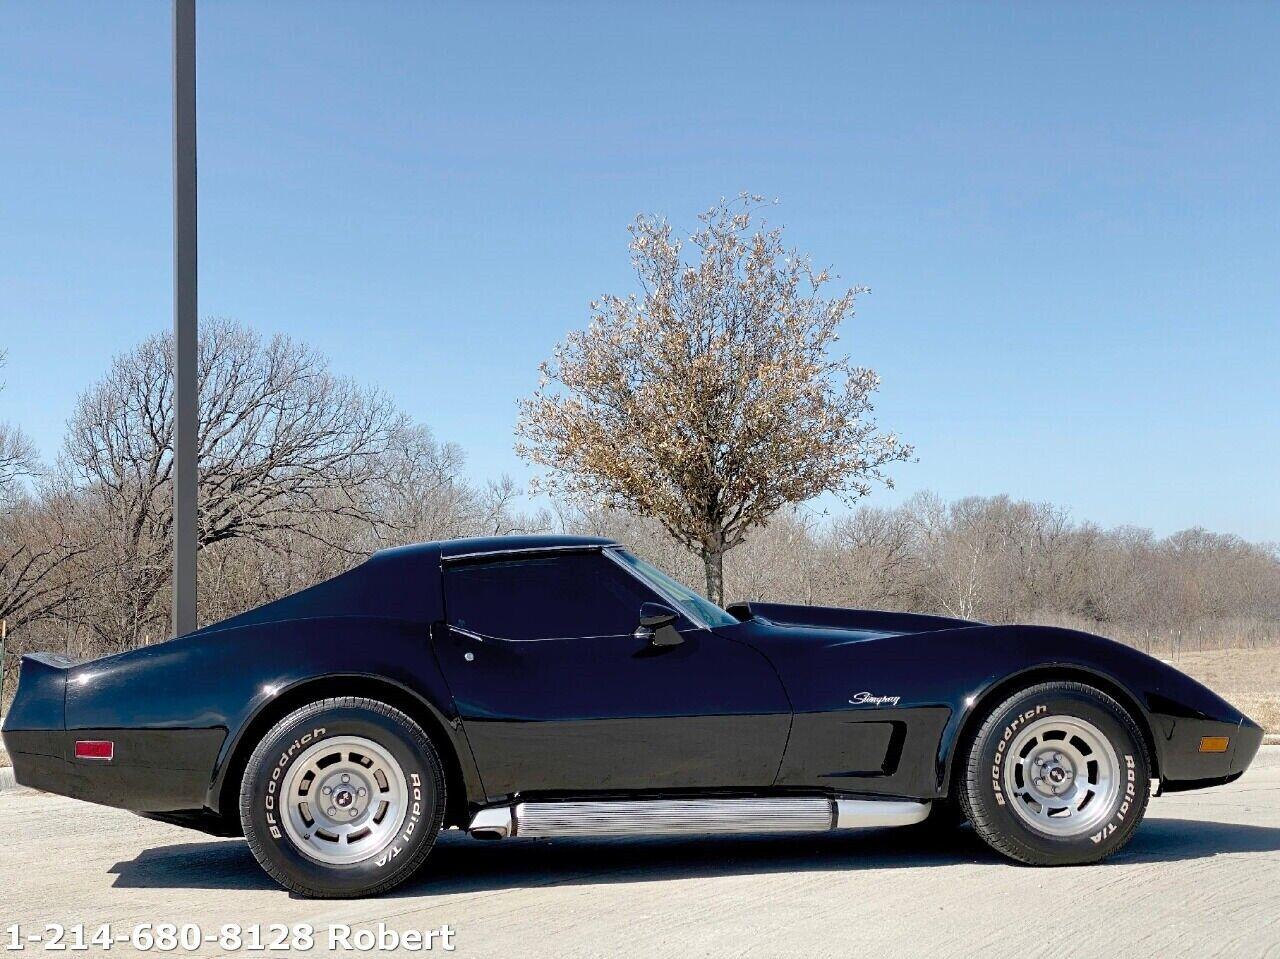 1976 Black Chevrolet Corvette Stingray  | C3 Corvette Photo 5